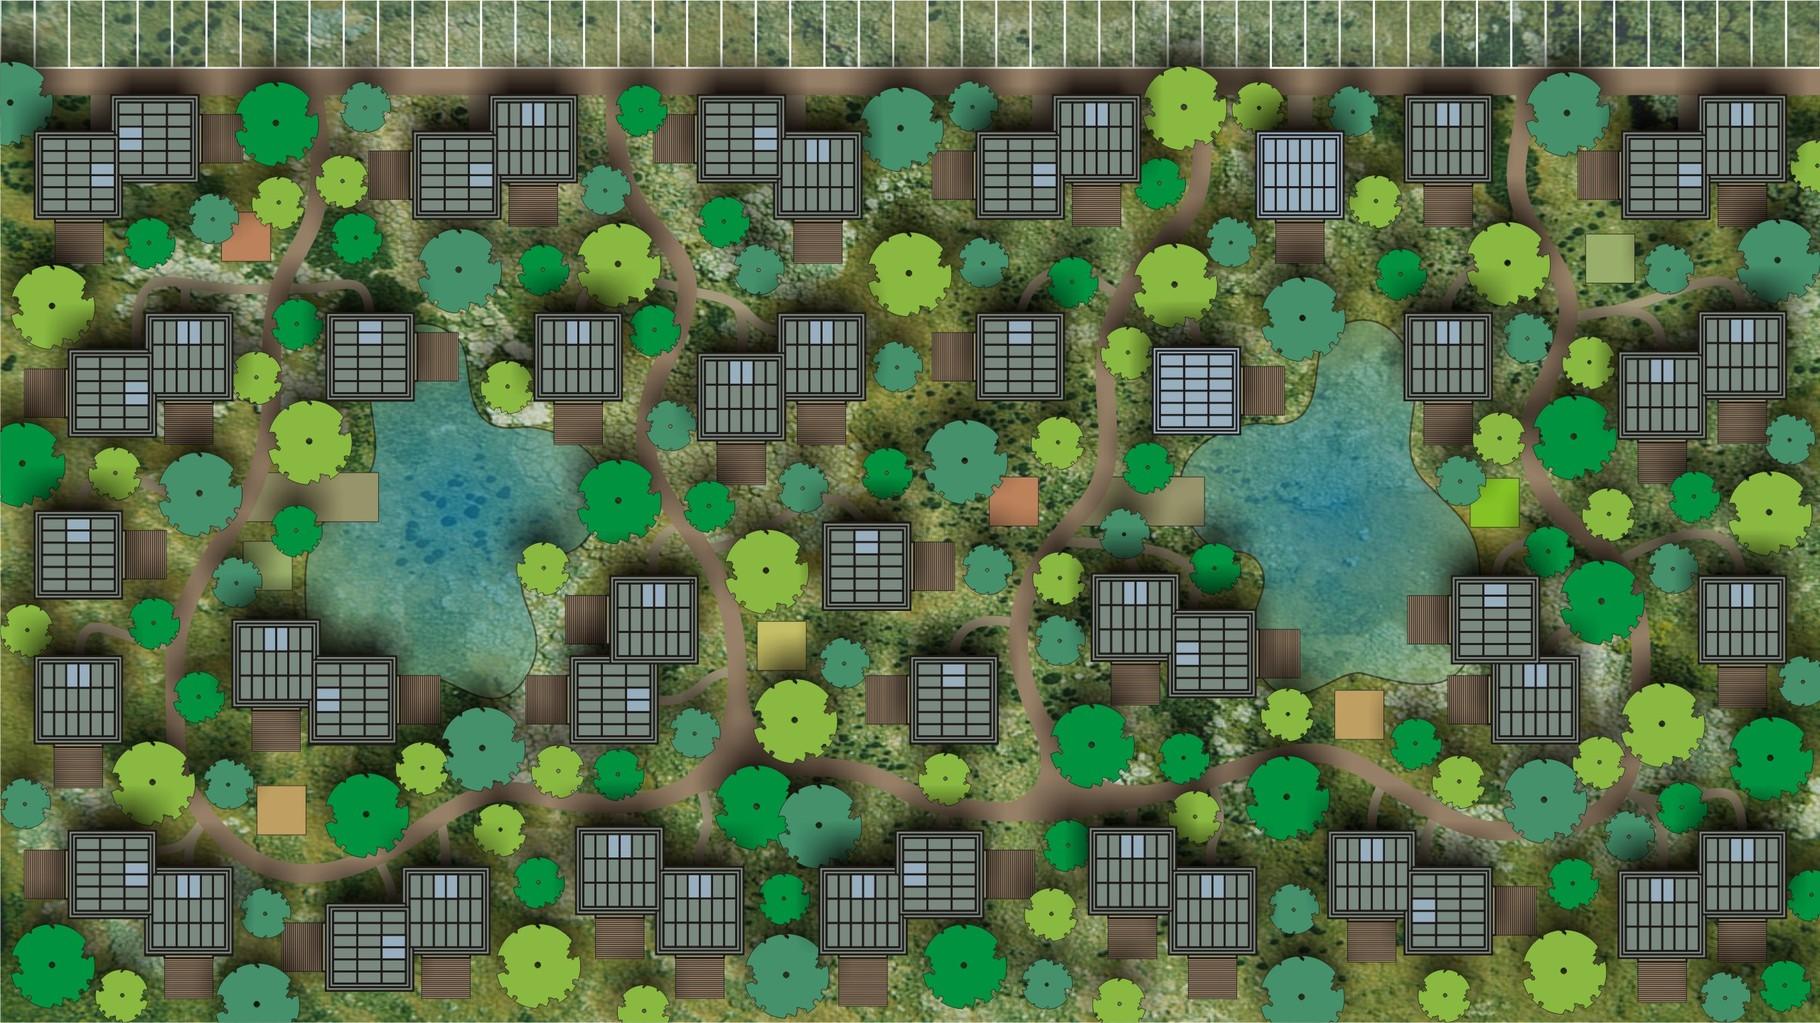 Visual OAS1S™: High-density 100% green & car-free urban design with integrated urban farming (& CLT).